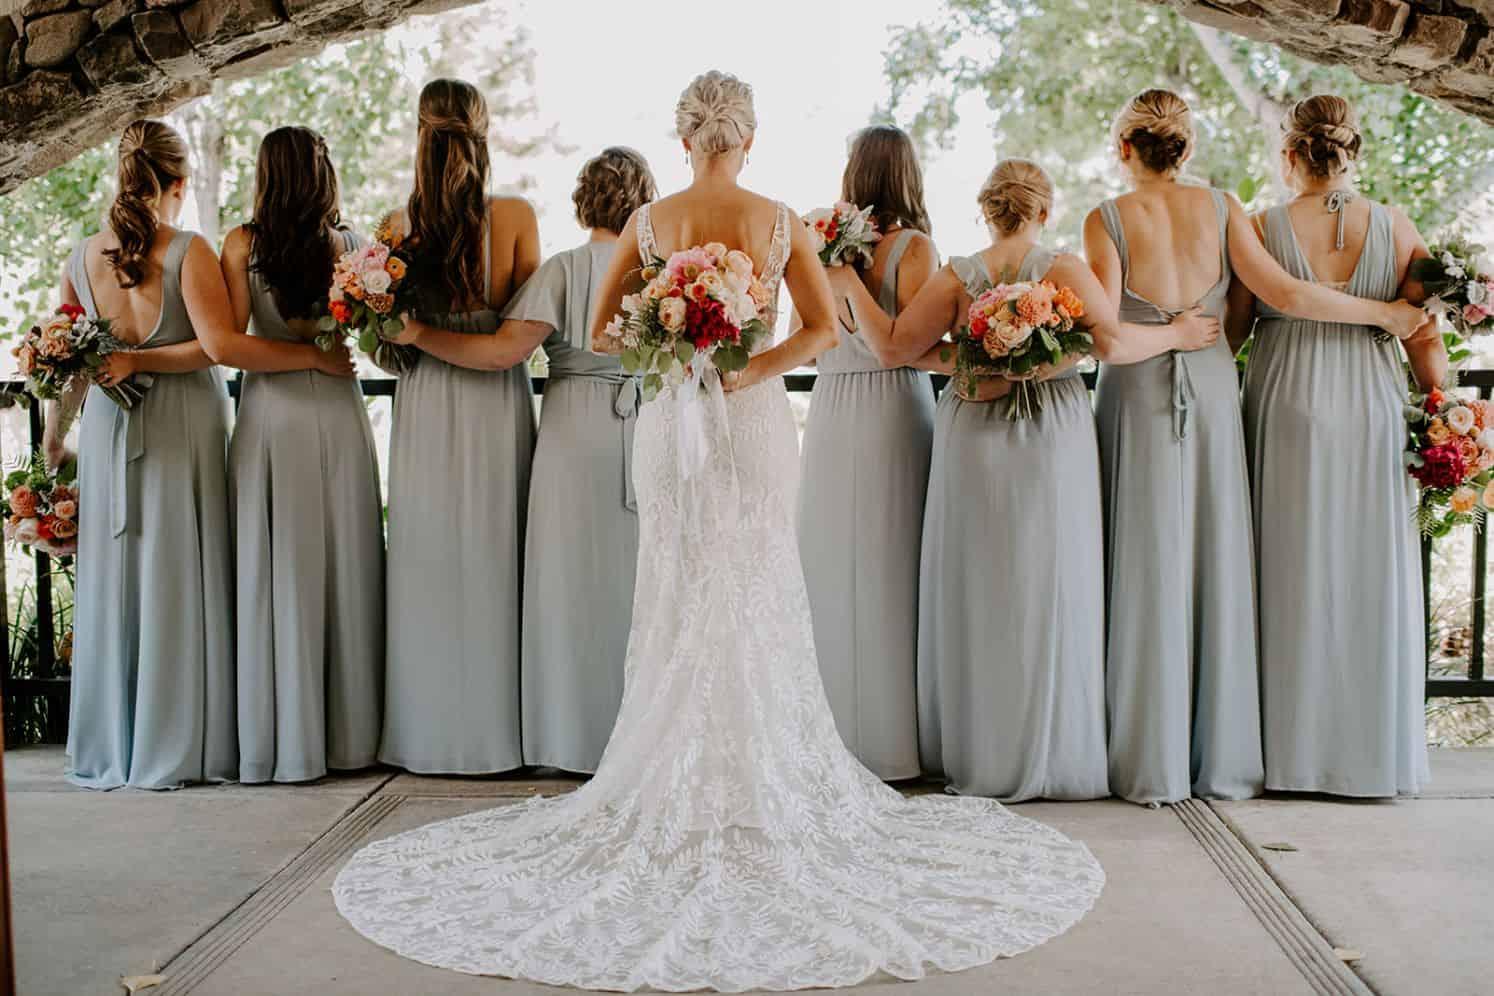 34 photo opportunities rustic mountain house estate weddingi venues northern california